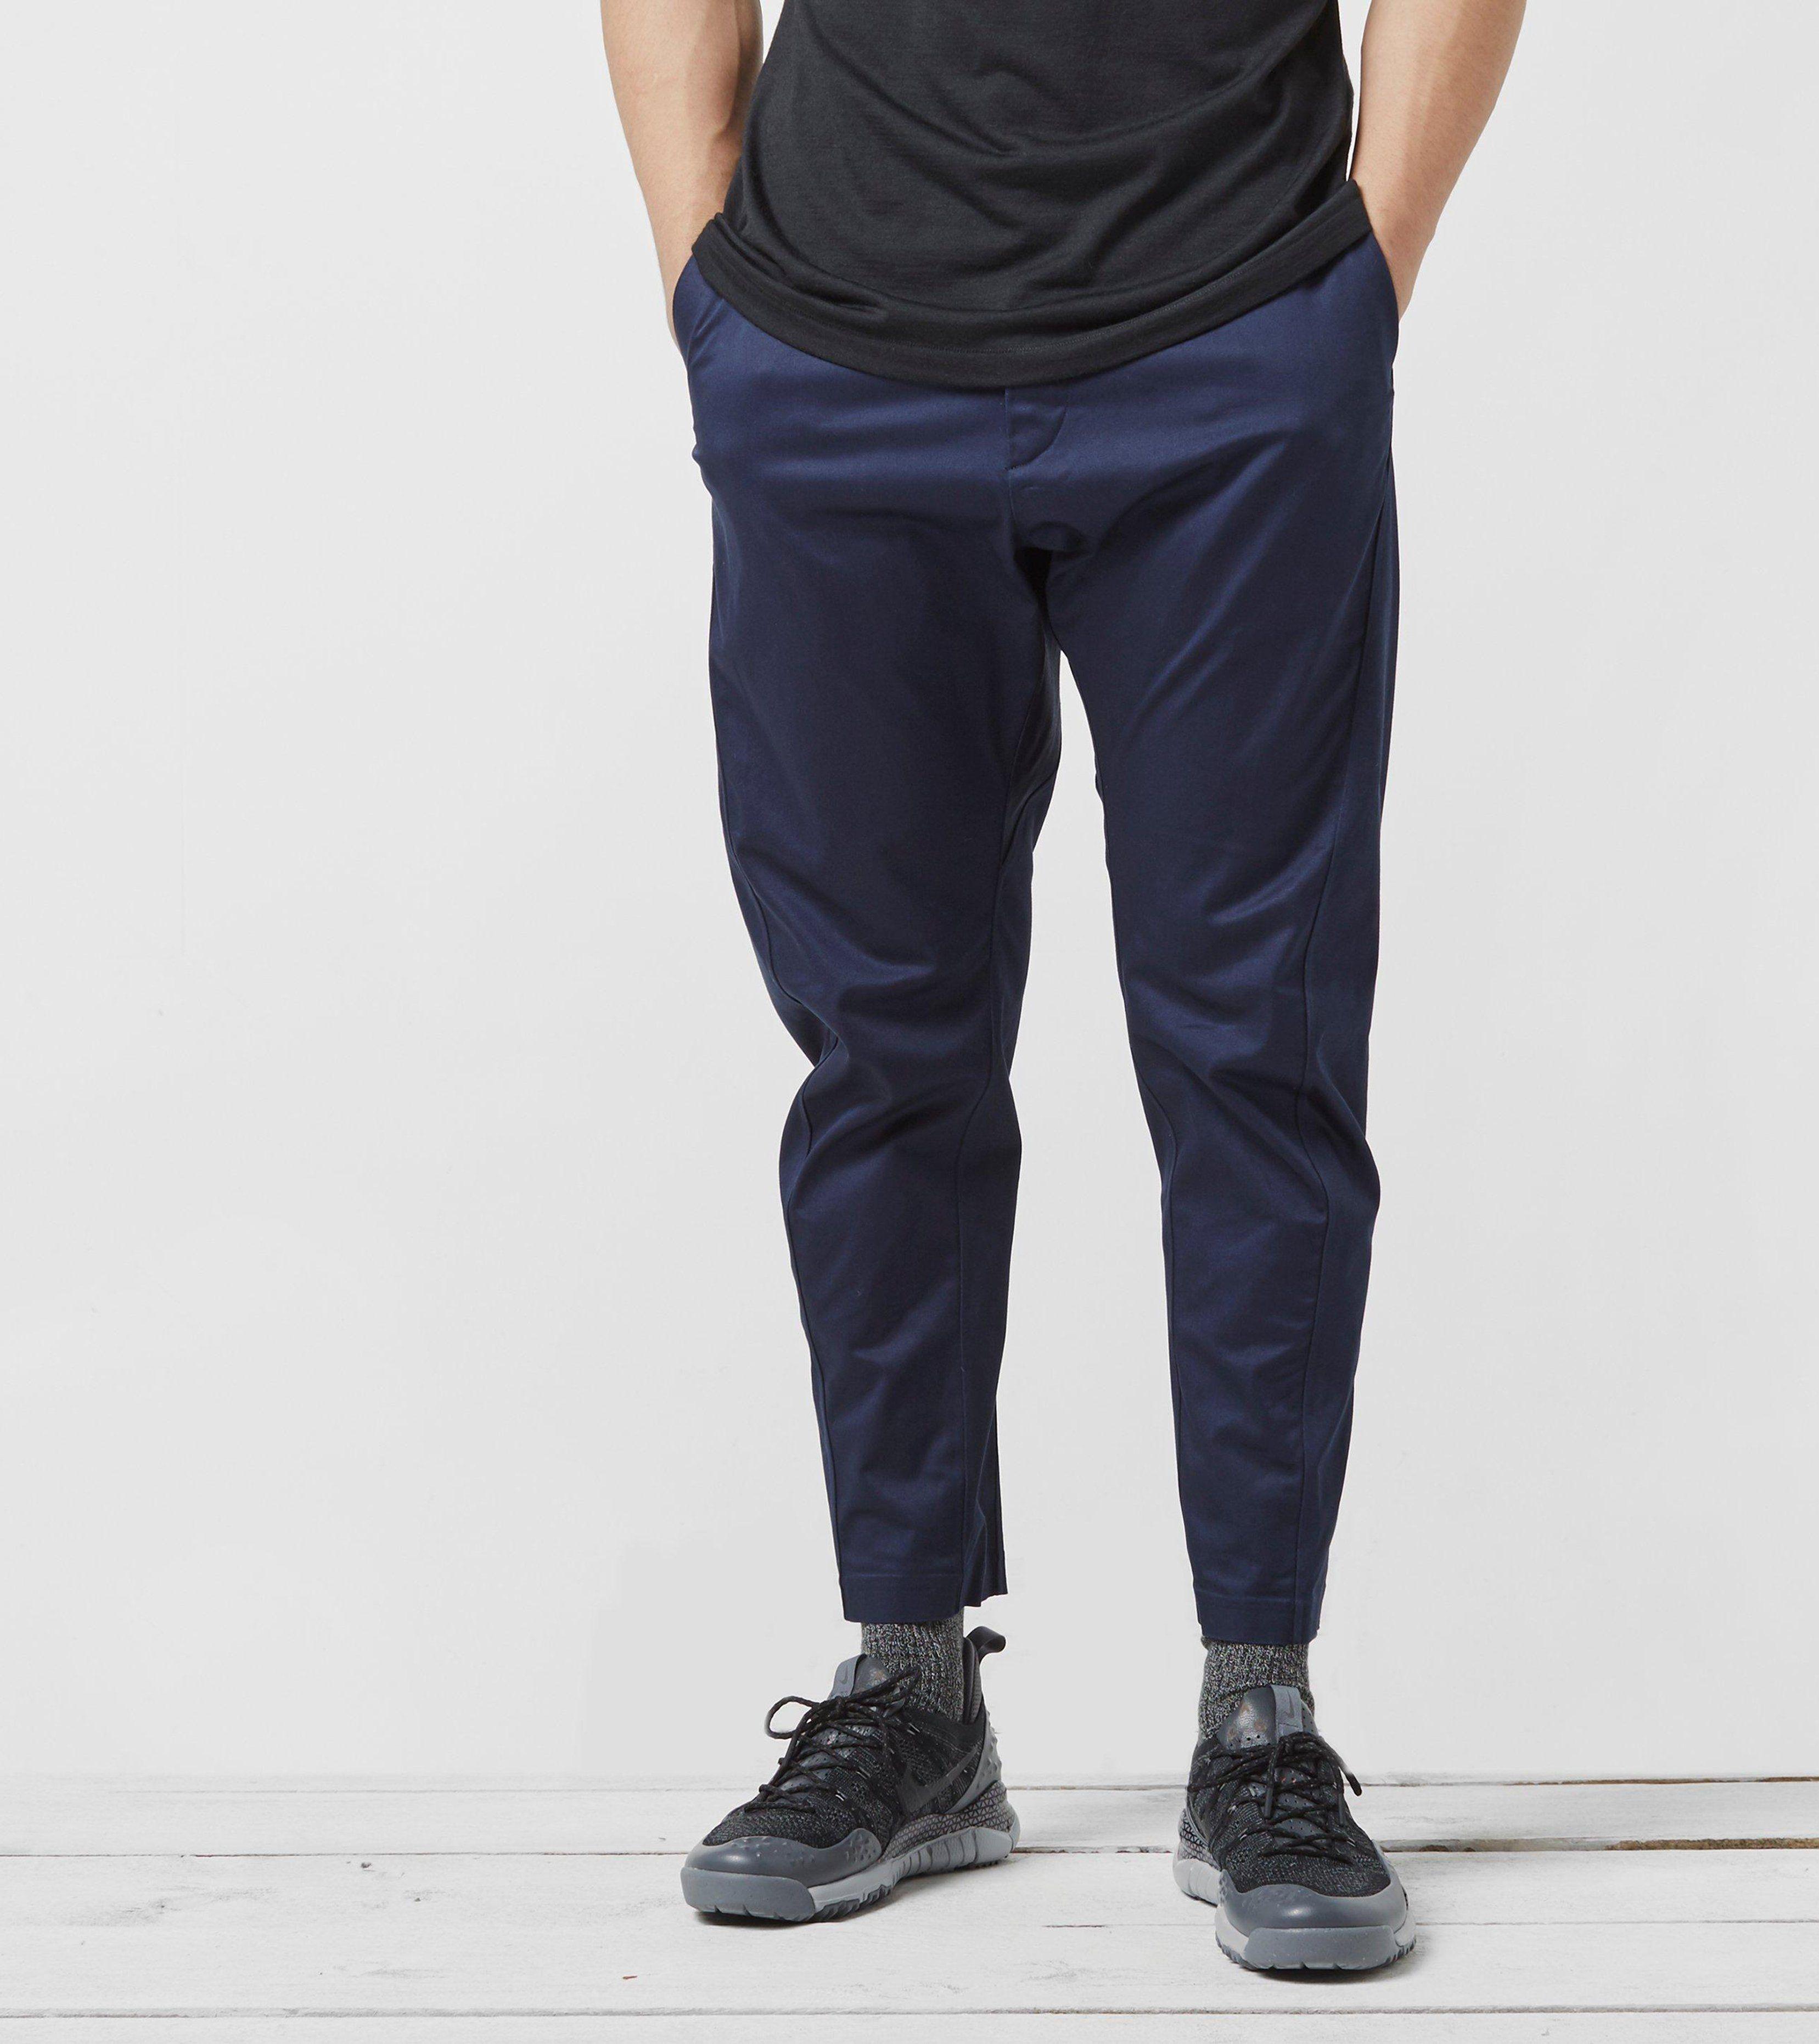 5c67b27572f95 NikeLab ACG Pants | Size?